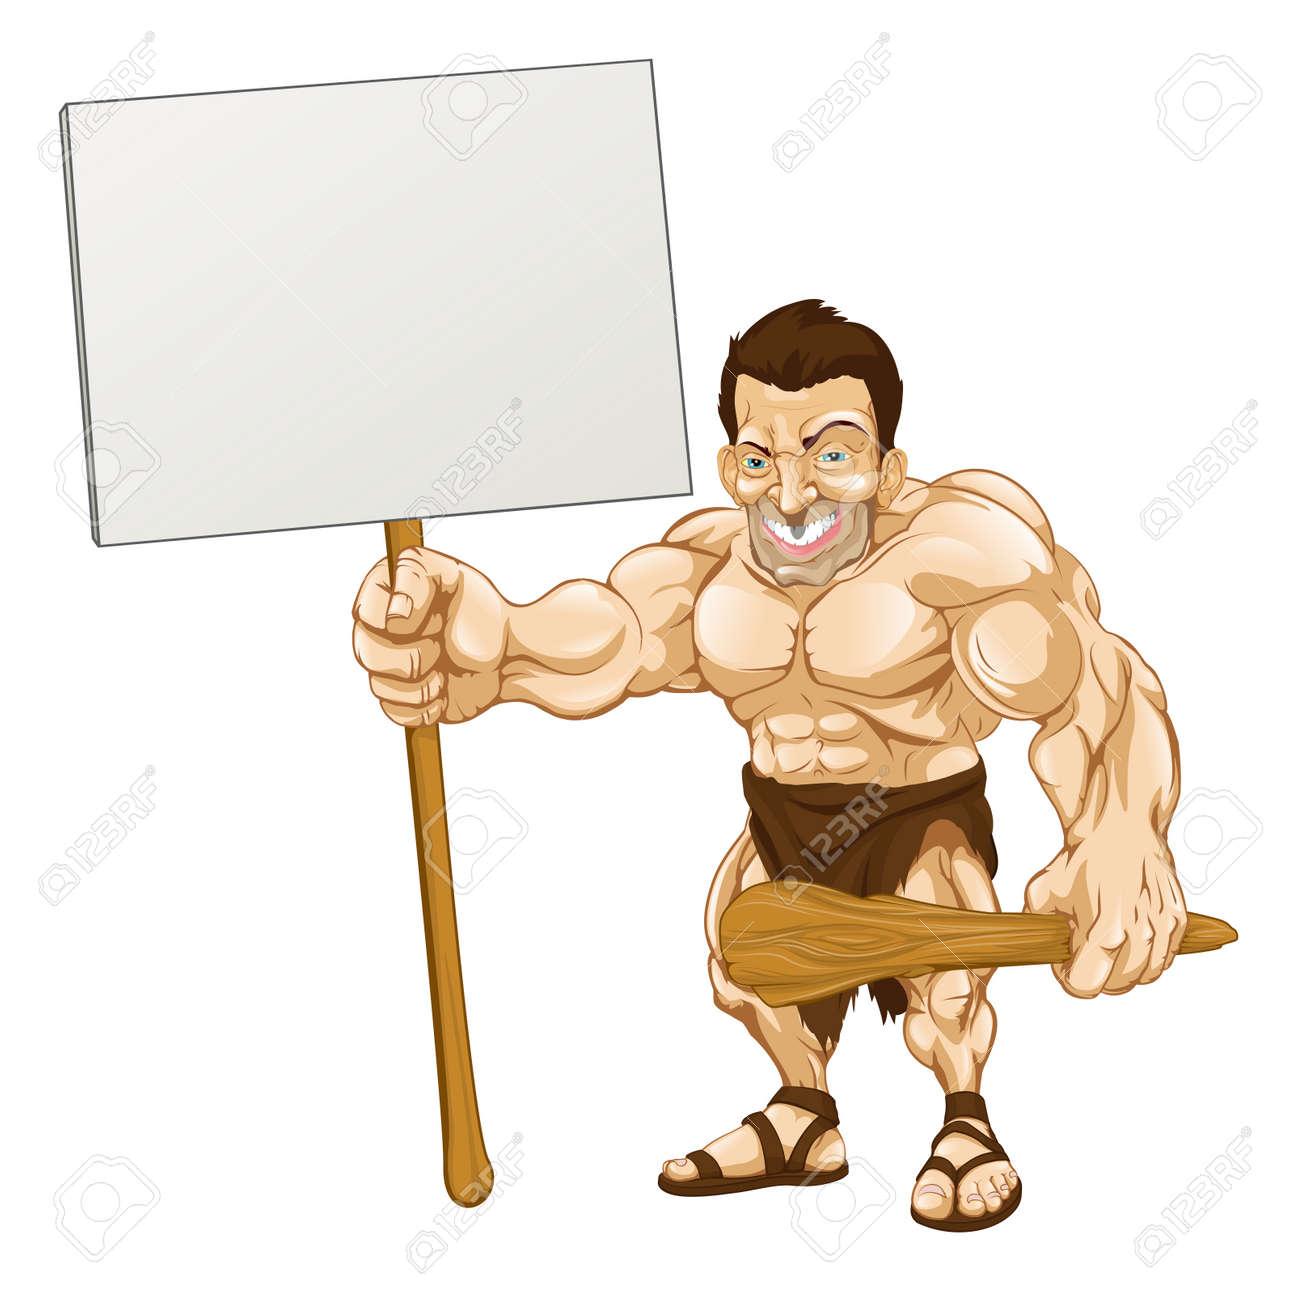 A cartoon illustration of a muscular caveman holding a sign Stock Vector - 10099702